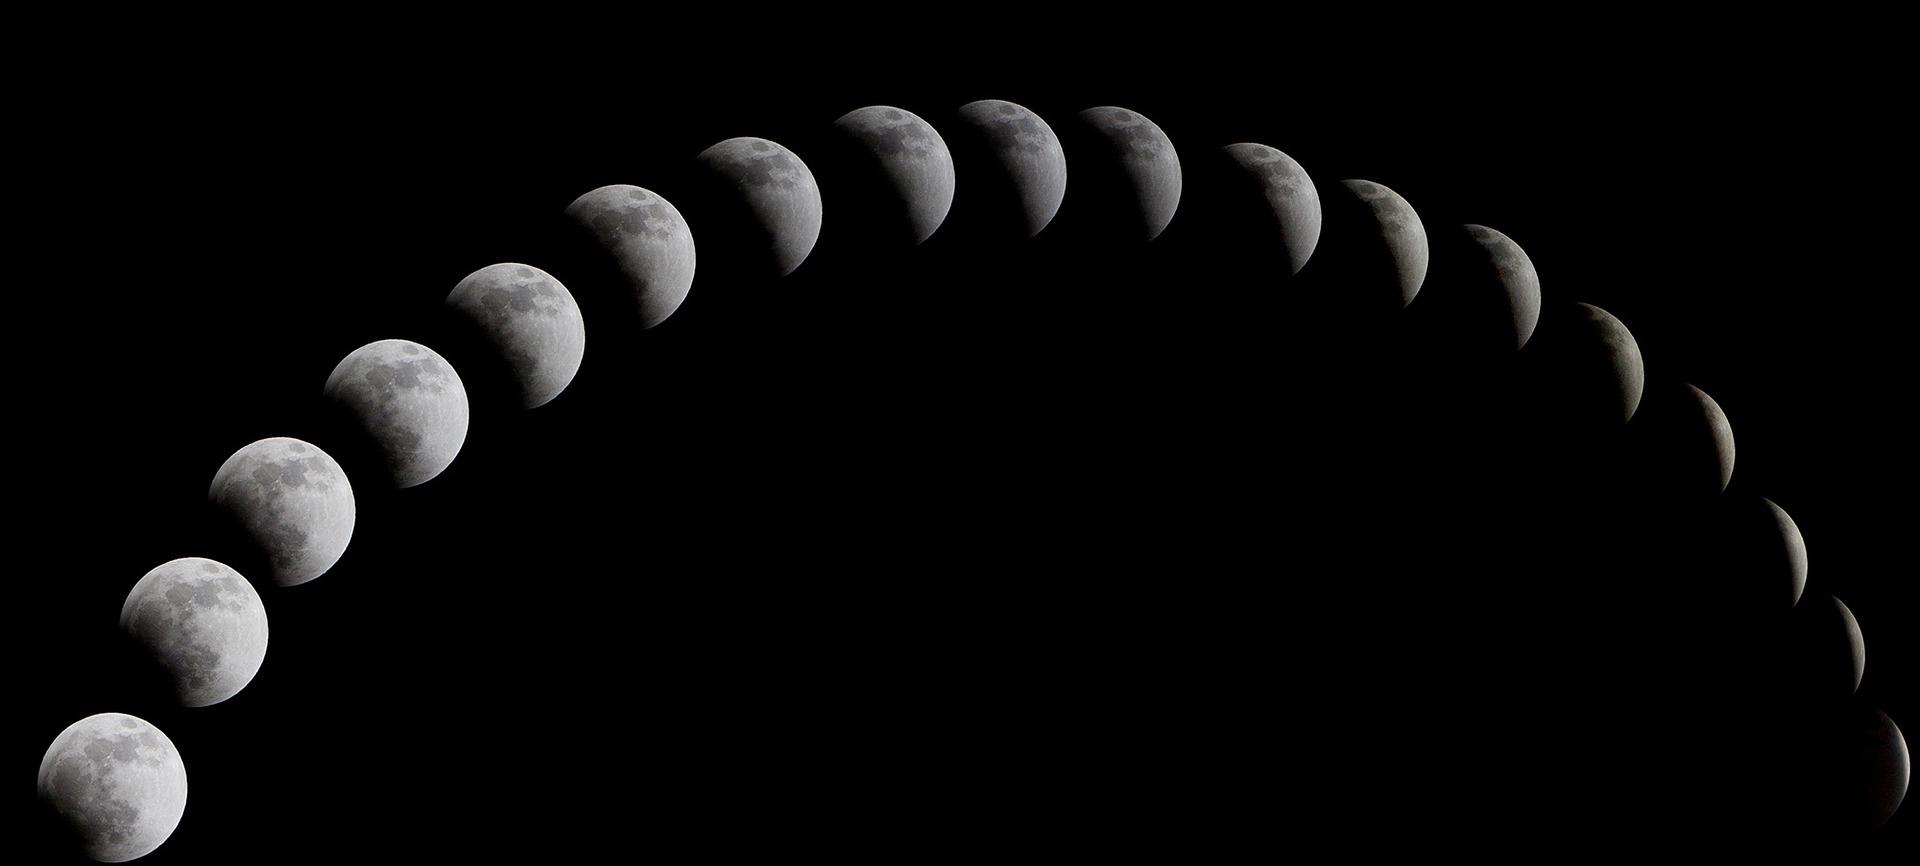 Mondzyklus pixabay